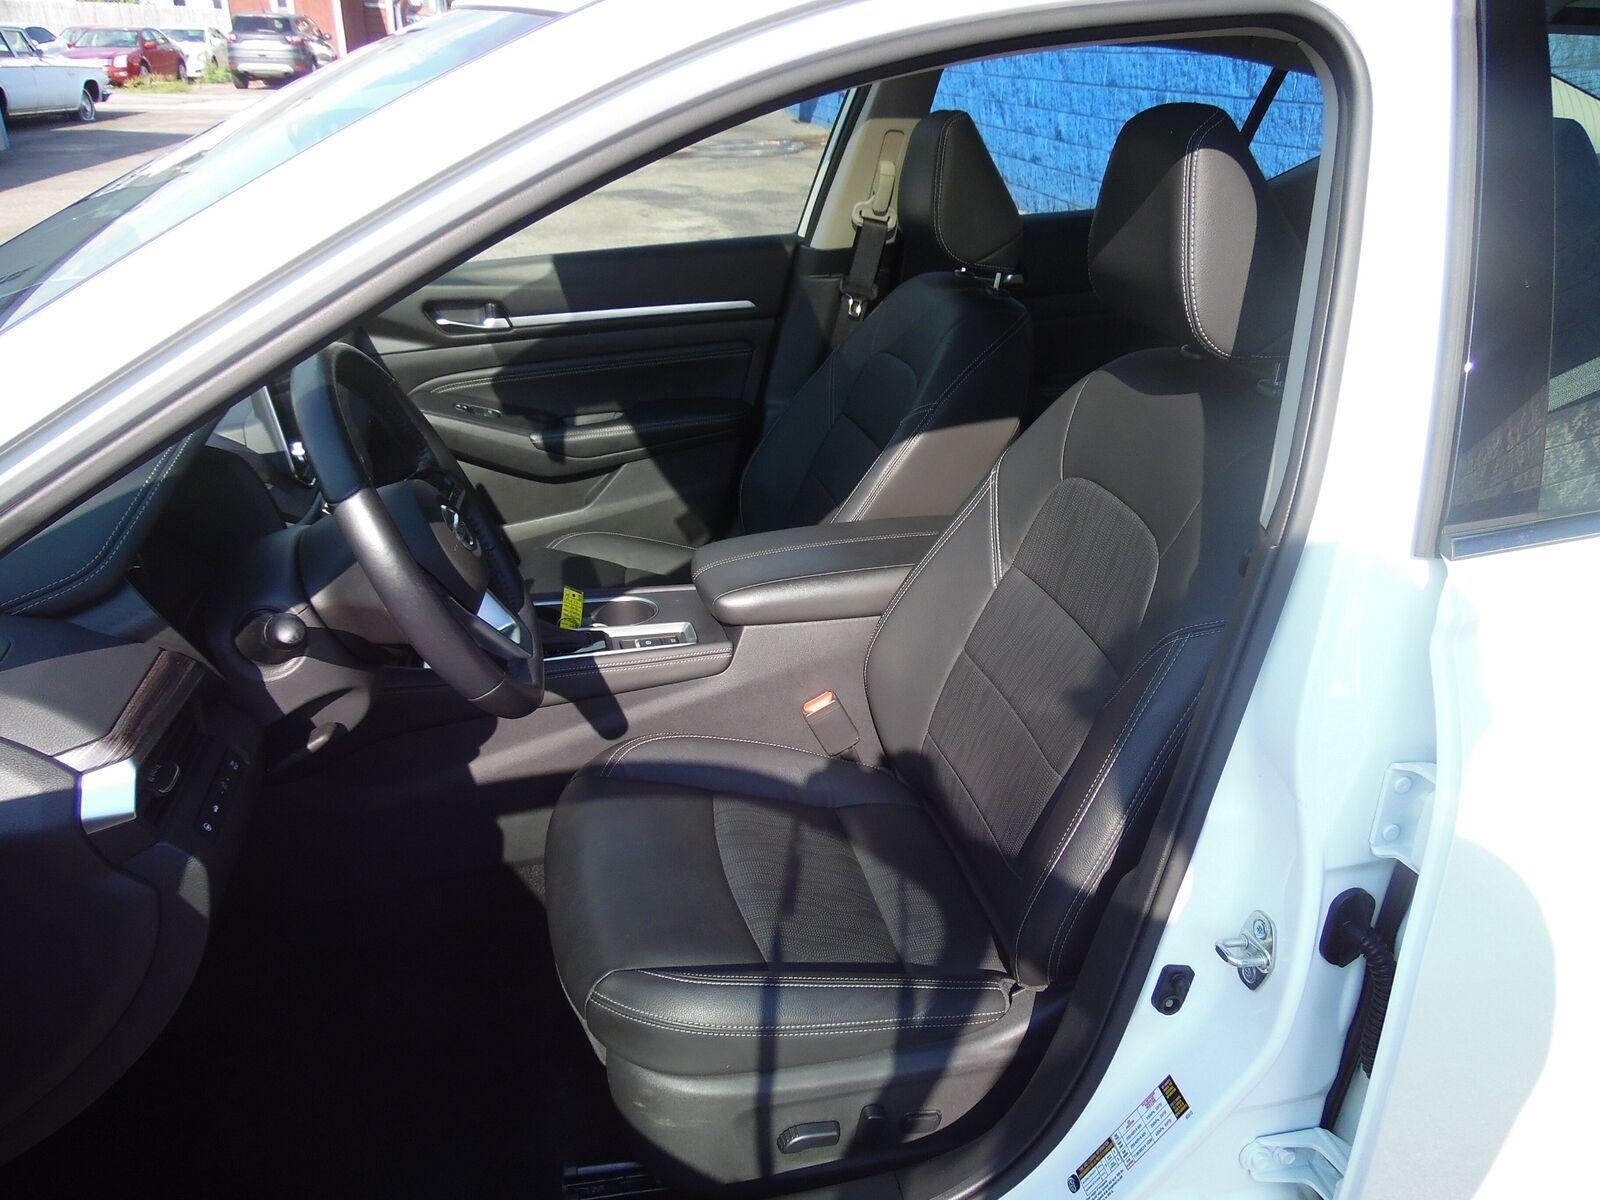 2019 Nissan Altima 2.5 Platinum 19476 Miles Pearl White Tricoat Sedan 2.5L 4-Cyl